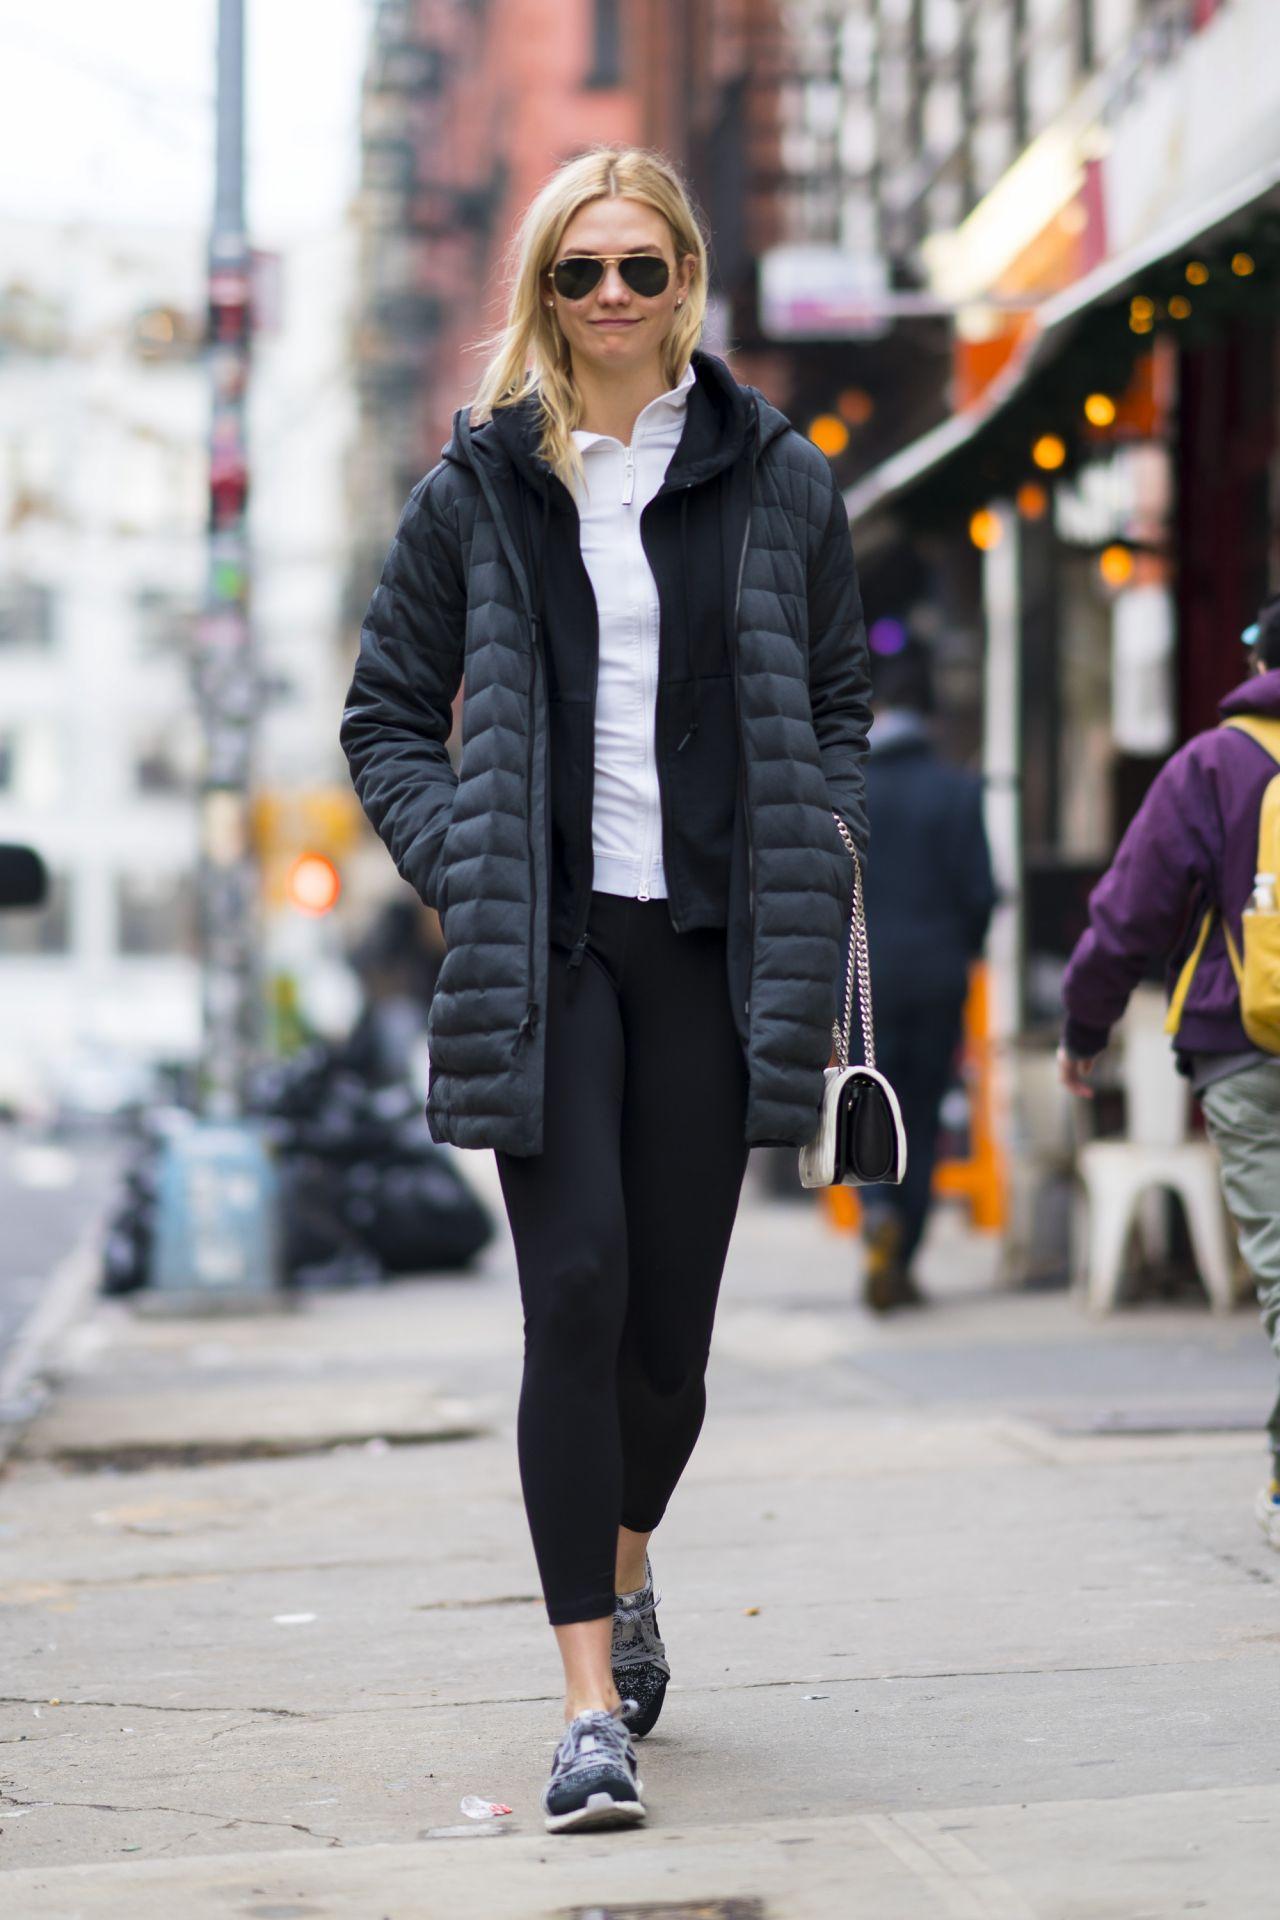 ee7085f20b9 Karlie Kloss Street Style - New York City 02 15 2018